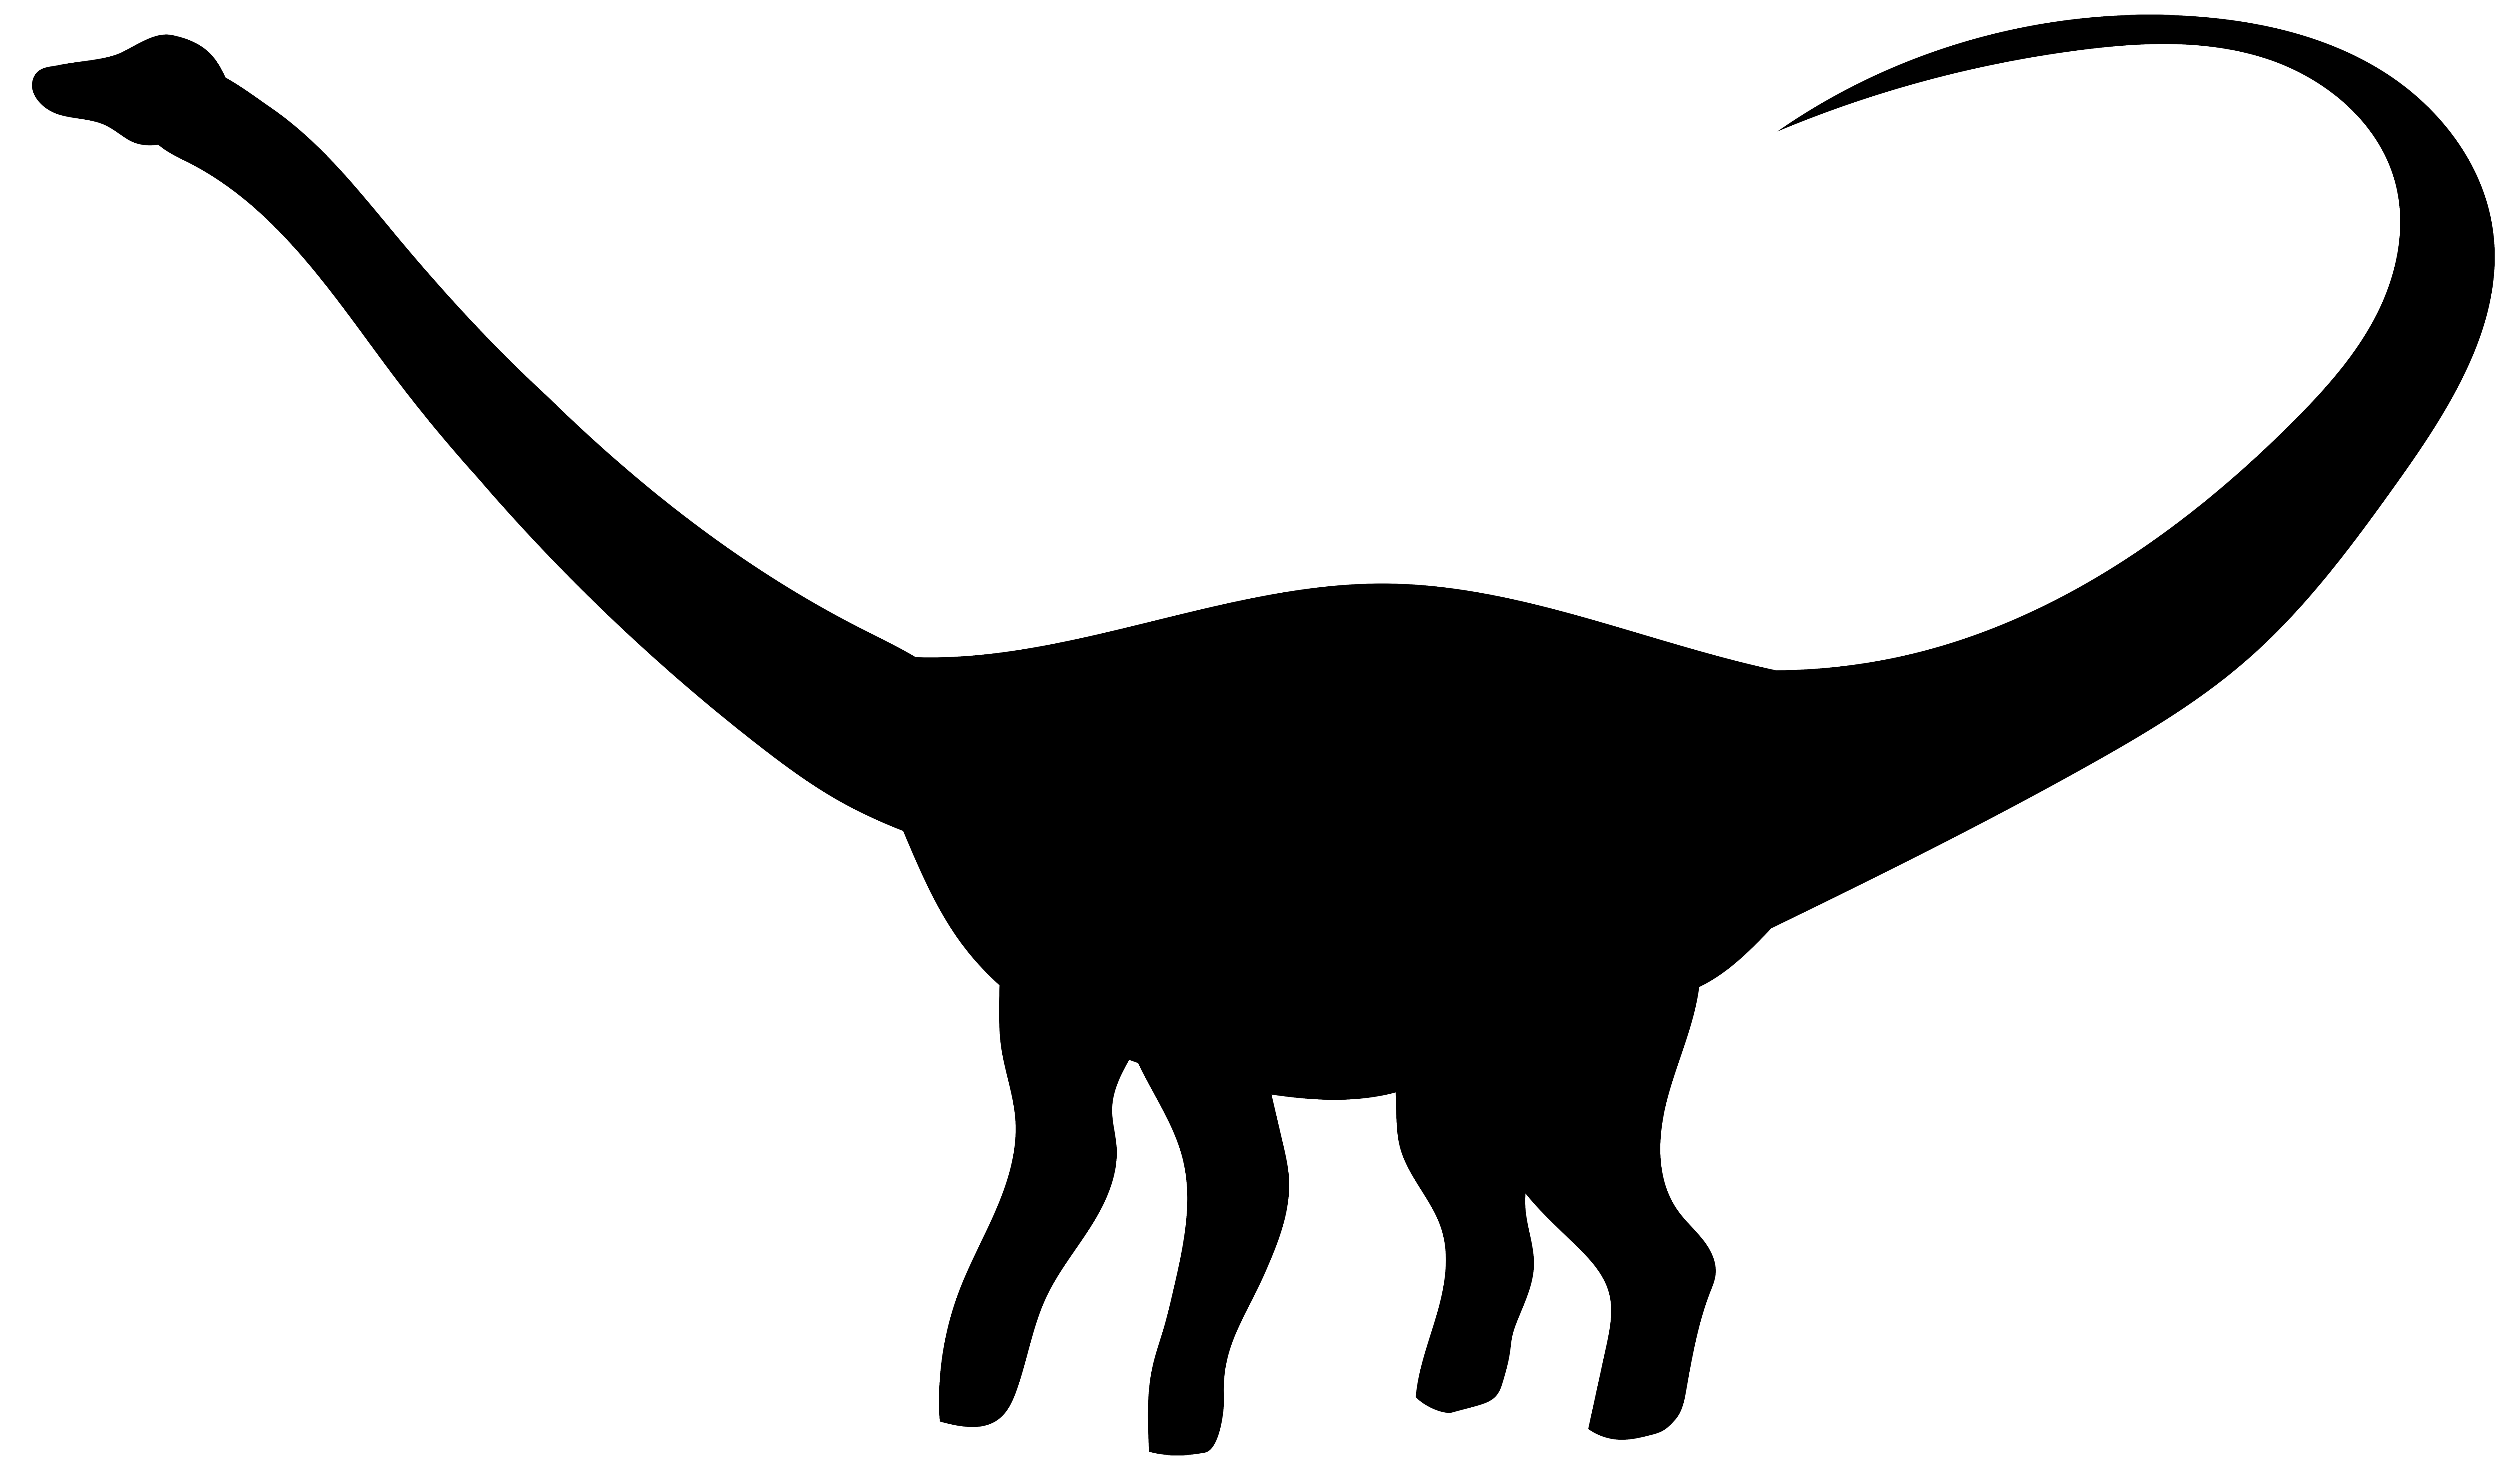 8000x4668 Dinosaur Silhouette Png Transparent Clip Art Imageu200b Gallery